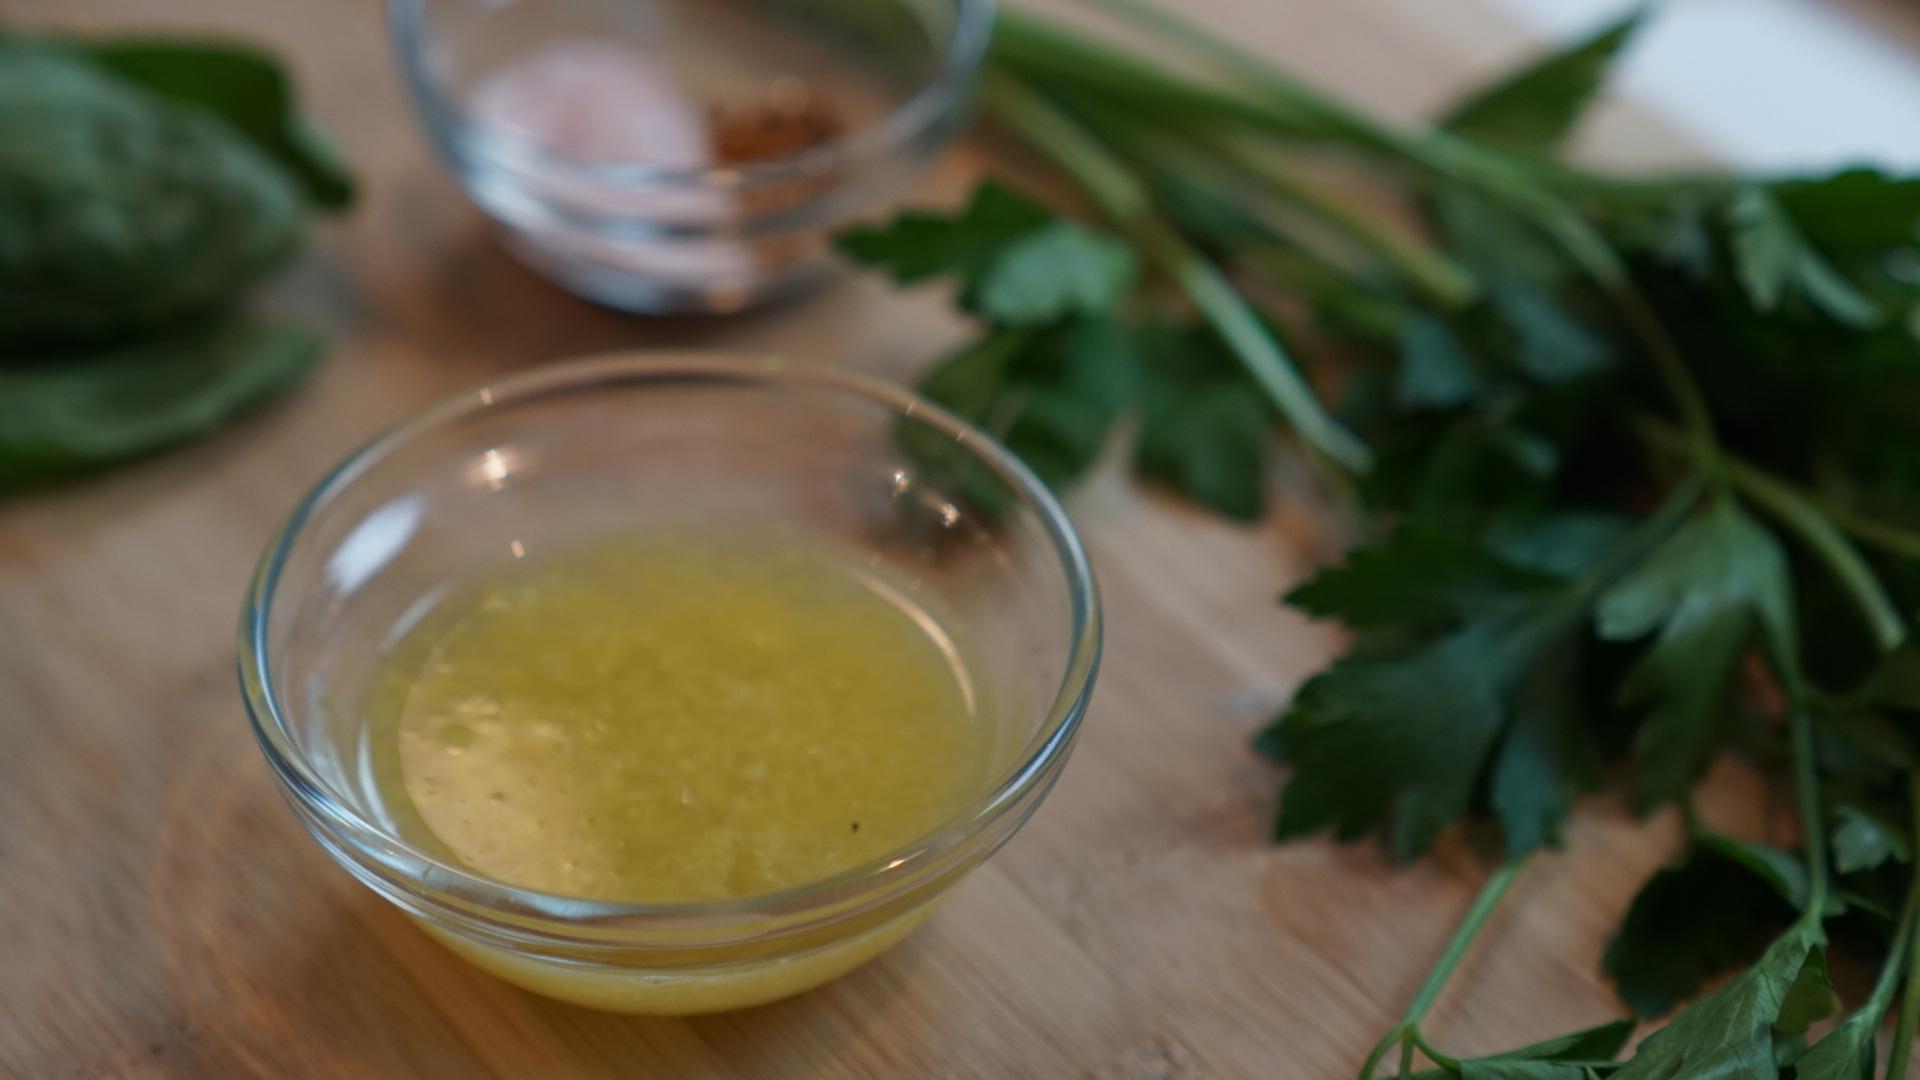 Zest and juice of 1 lemon